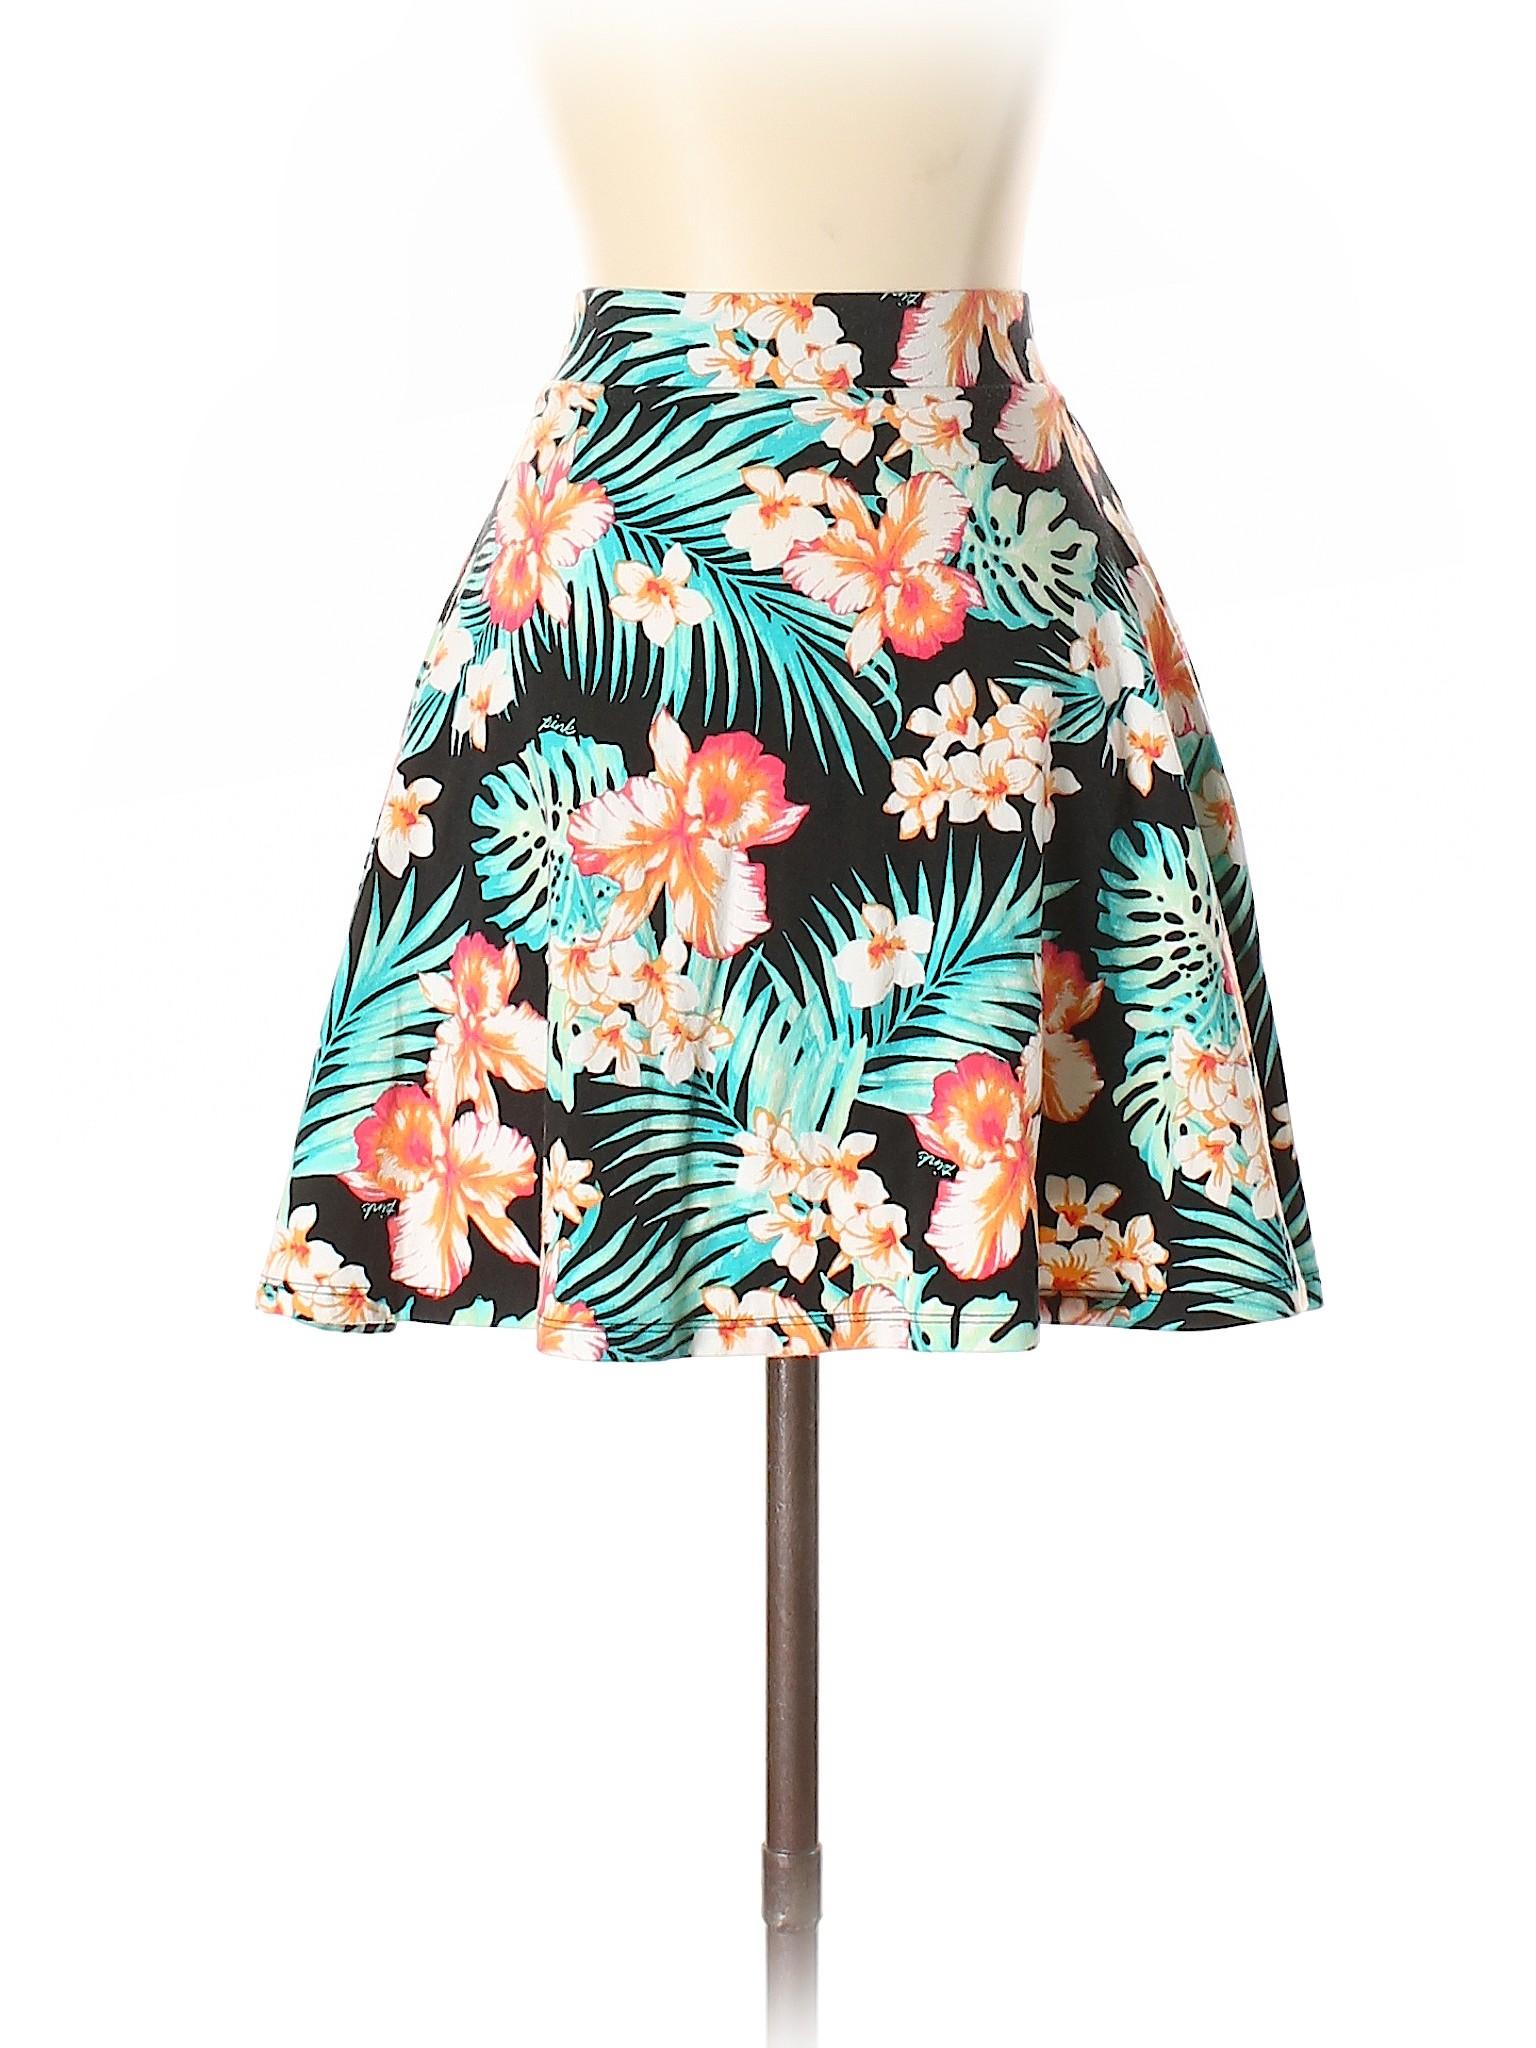 Boutique Boutique Boutique Casual Boutique Skirt Skirt Skirt Casual Casual nwYqIzHp